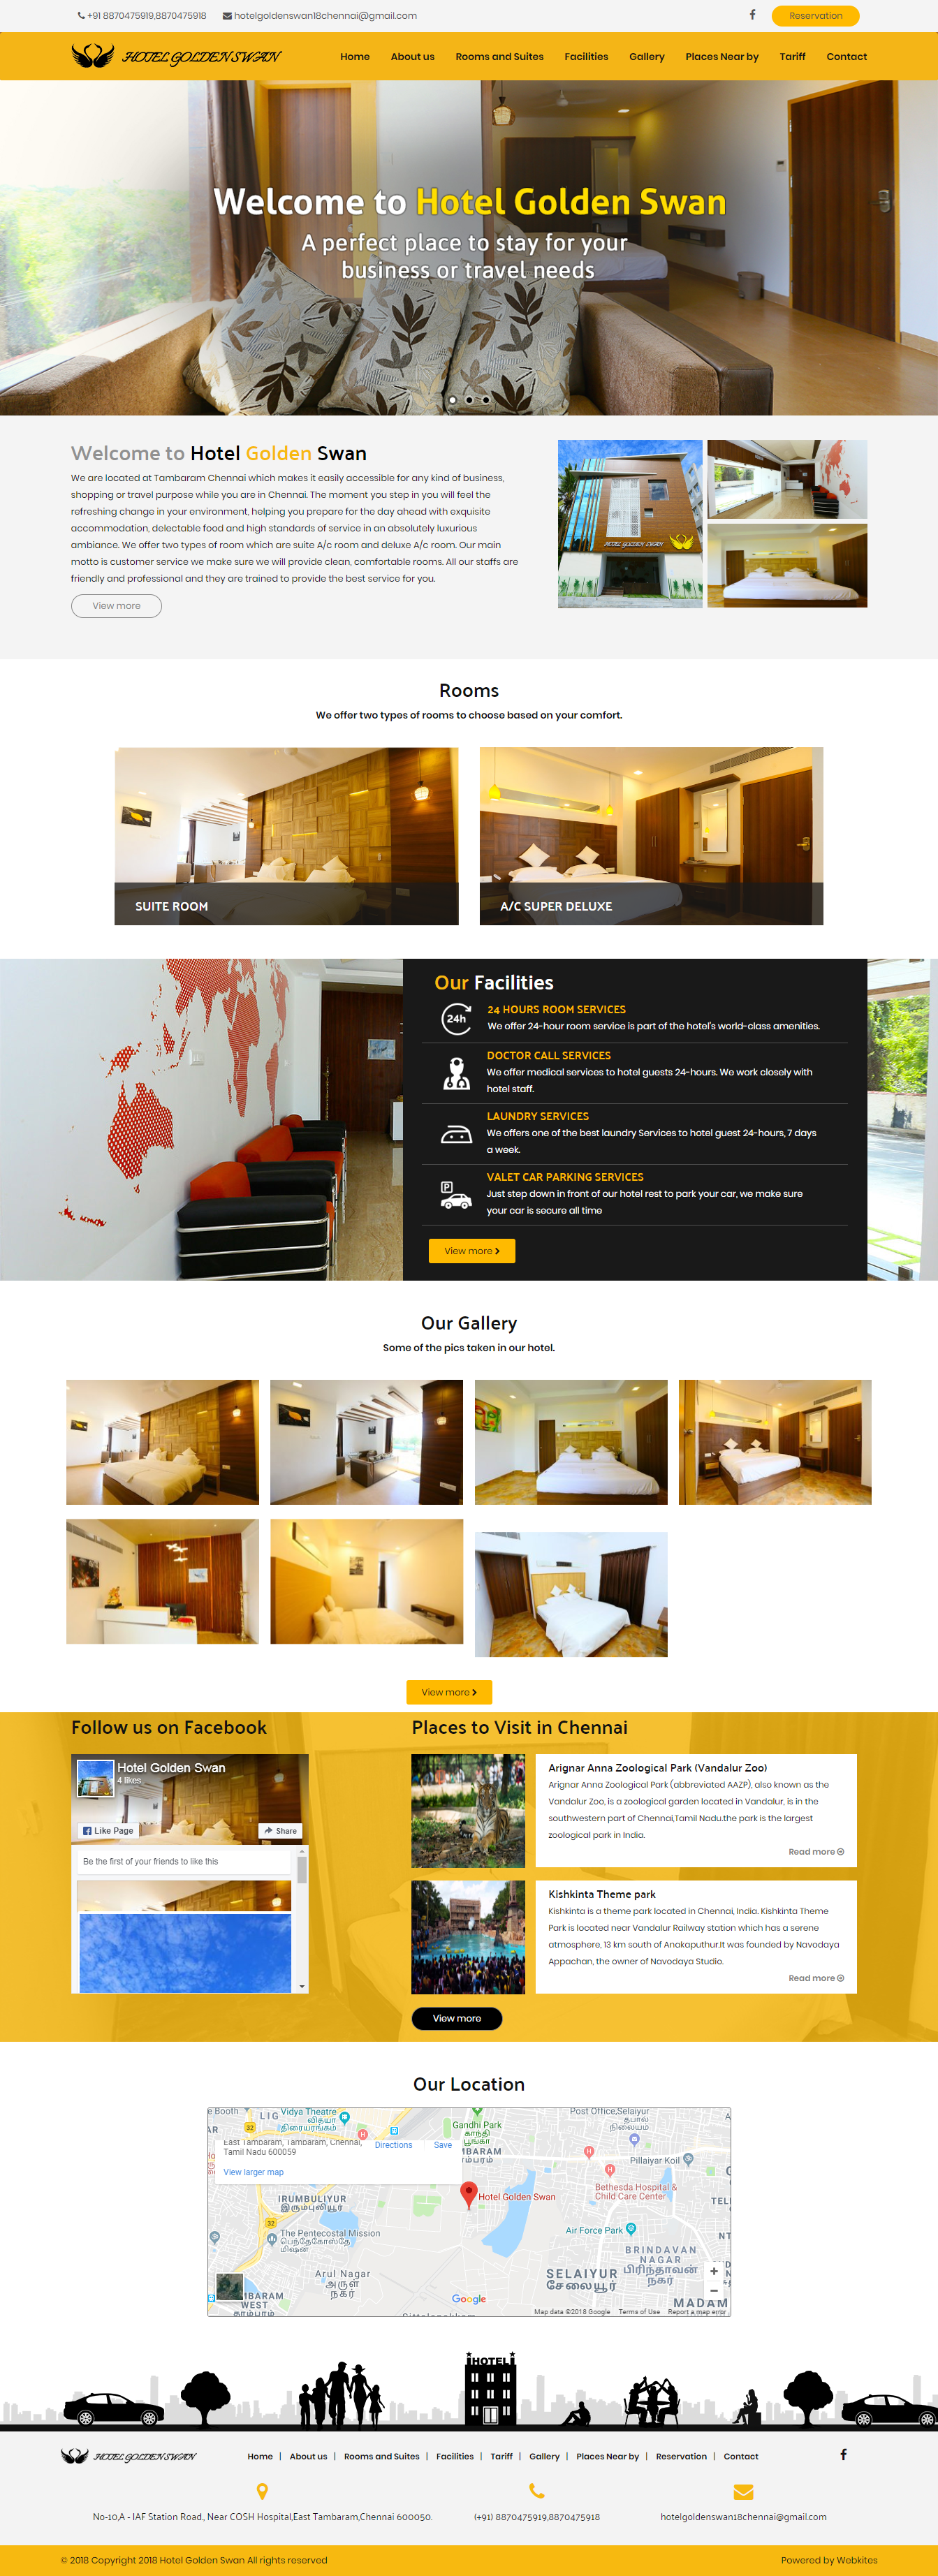 Dynamic websites for hotelgoldenswanchennai